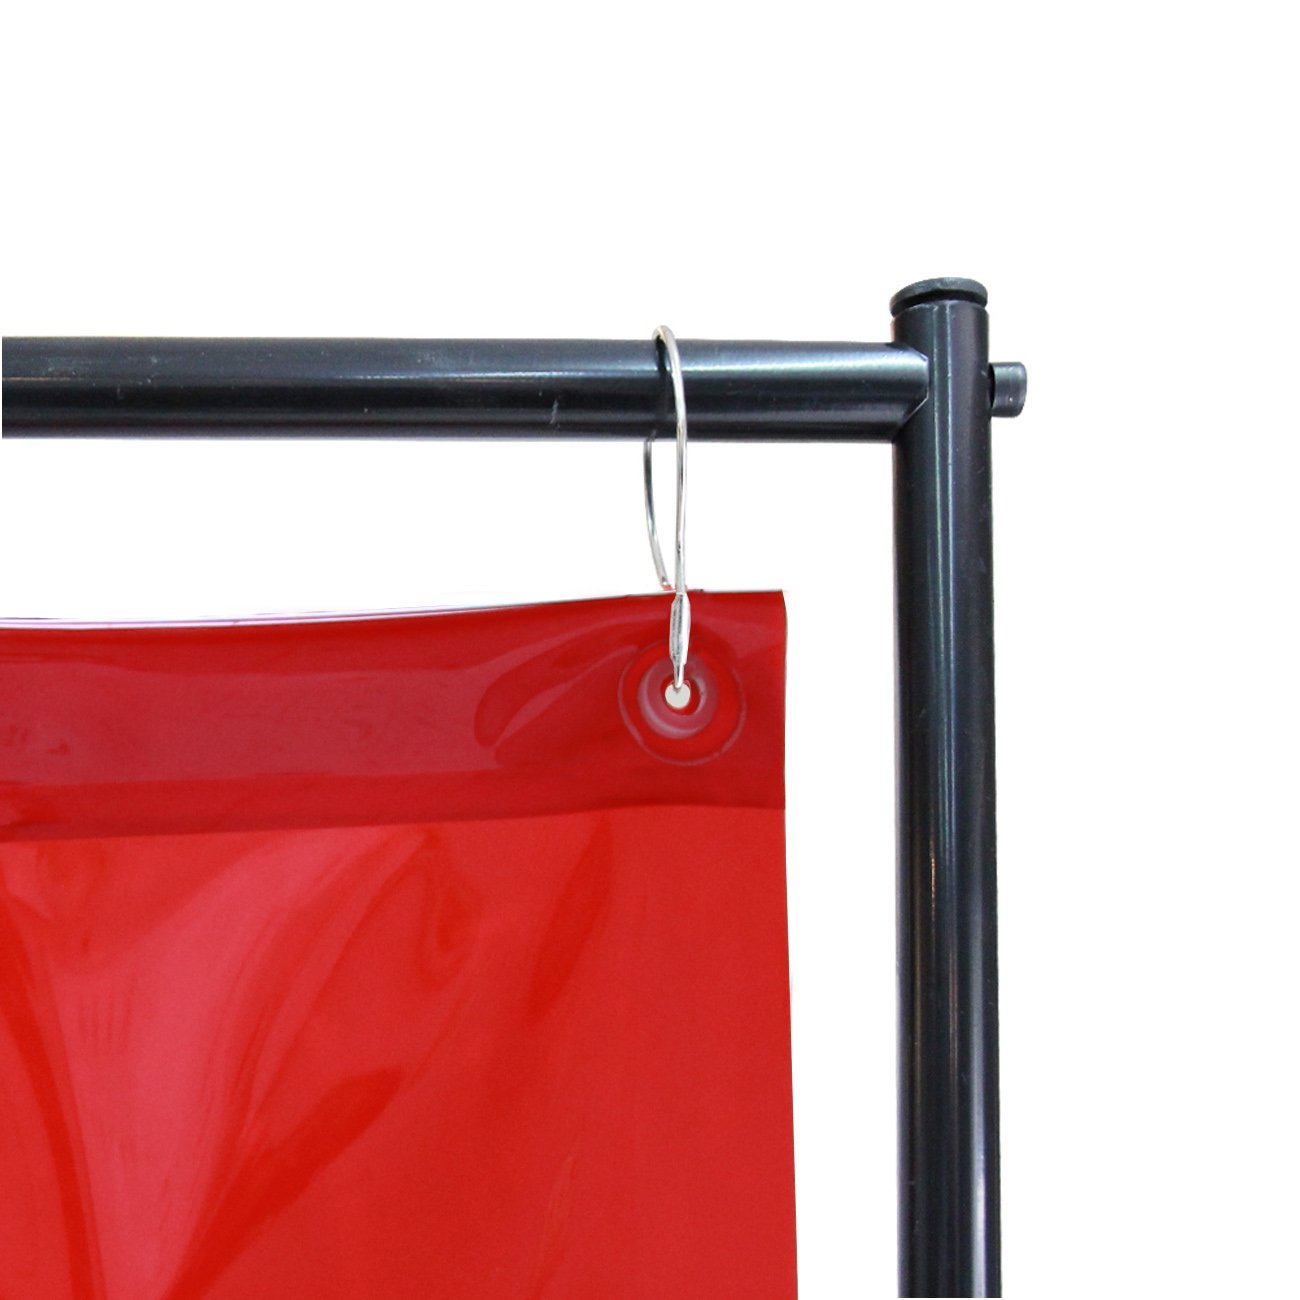 VIZ-PRO Red Vinyl Welding Curtain/Welding Screen With Frame, 6' x 6' by VIZ-PRO (Image #3)